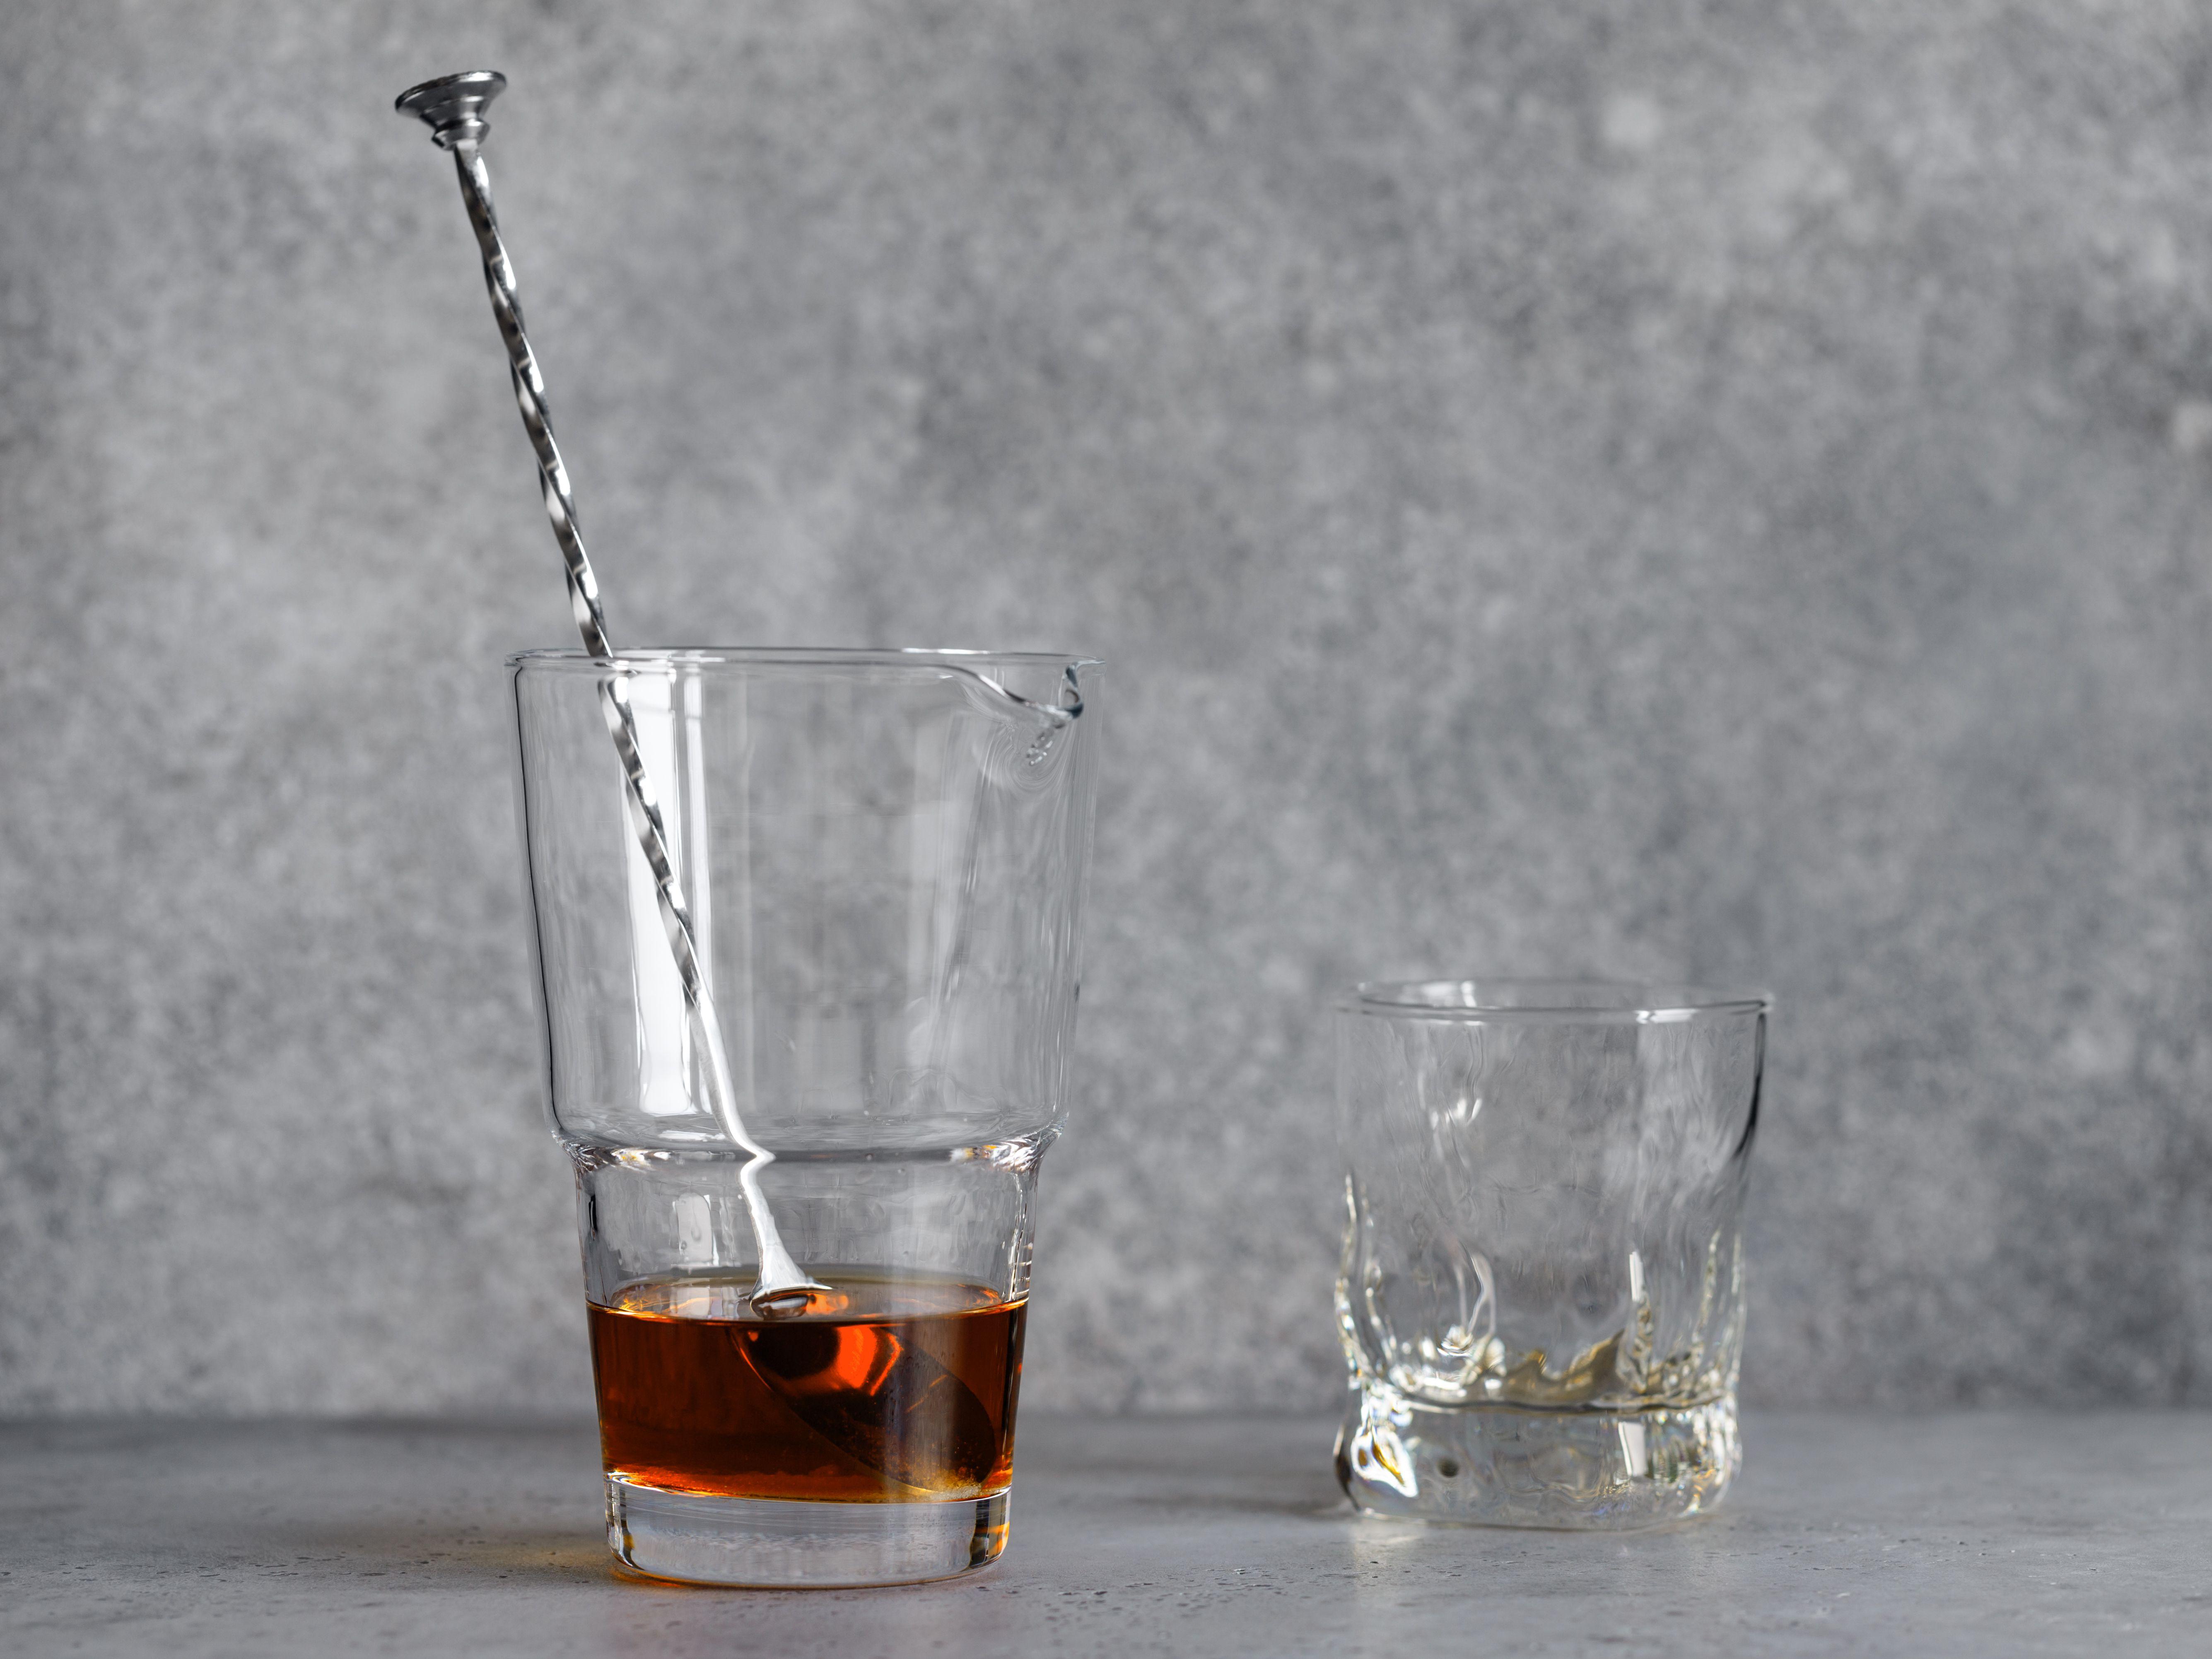 Stir rye whiskey into the glass